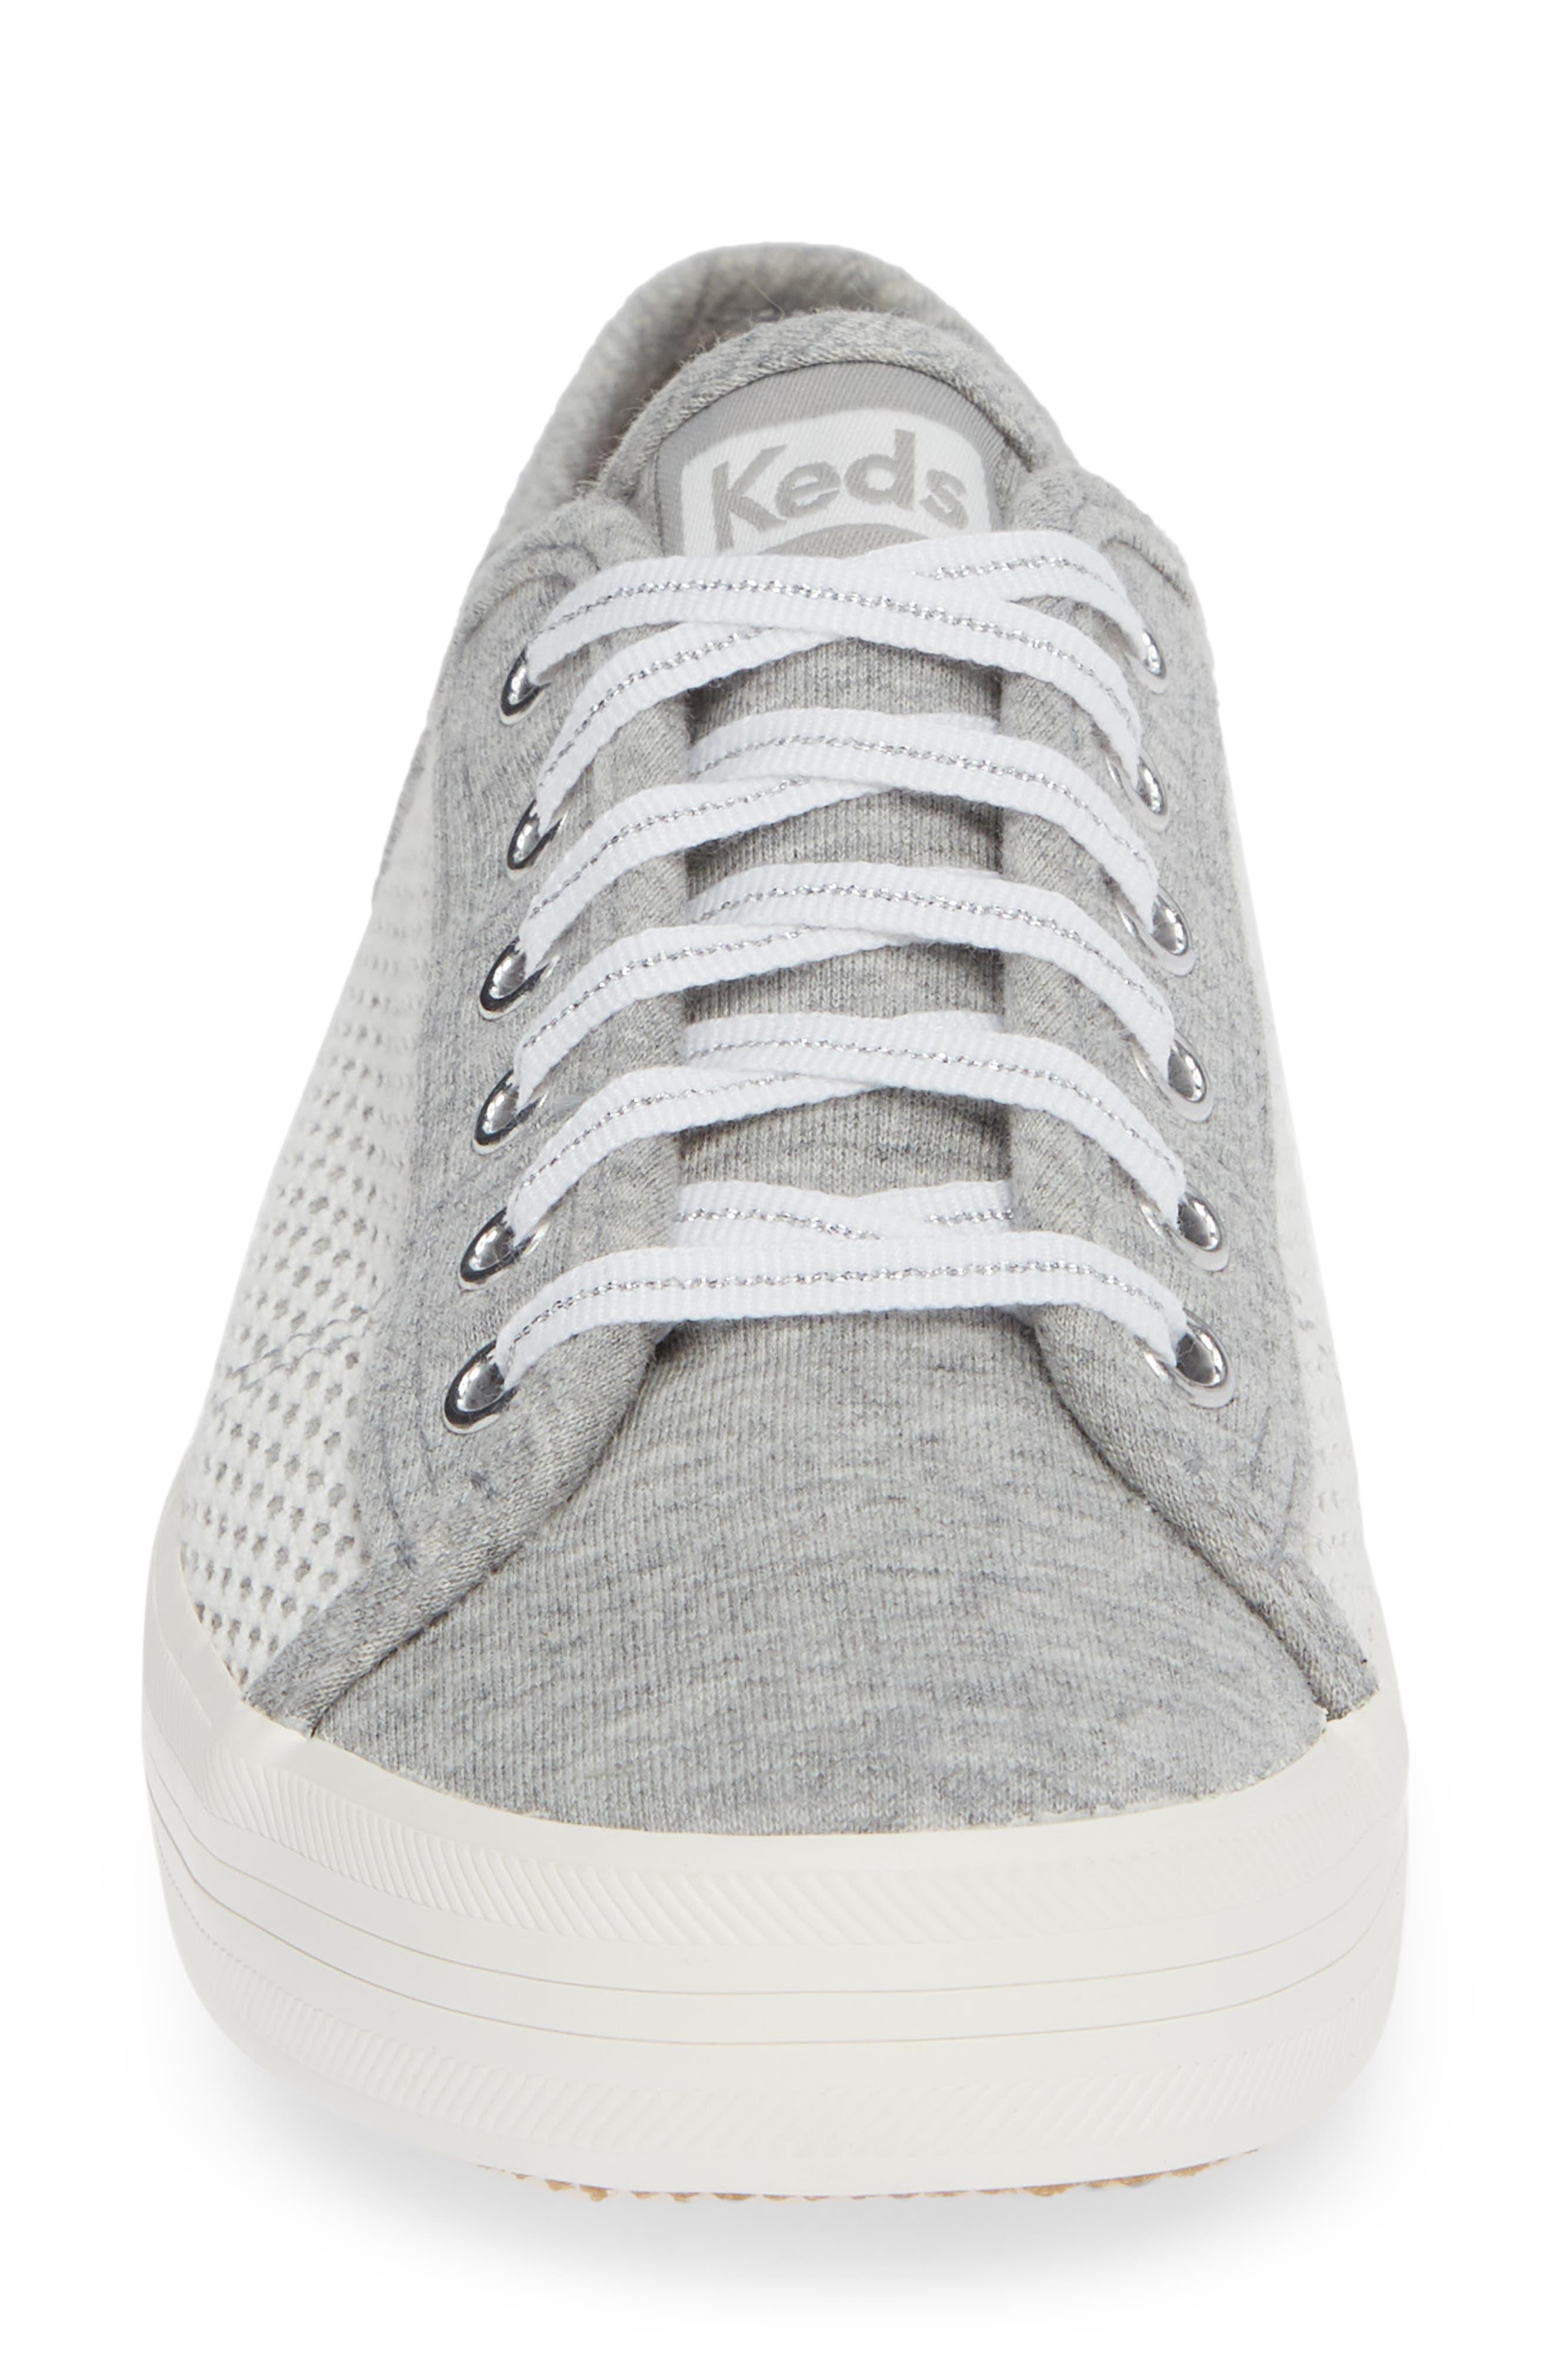 KEDS<SUP>®</SUP>, Kickstart Mesh & Jersey Sneaker, Alternate thumbnail 4, color, LIGHT GRAY